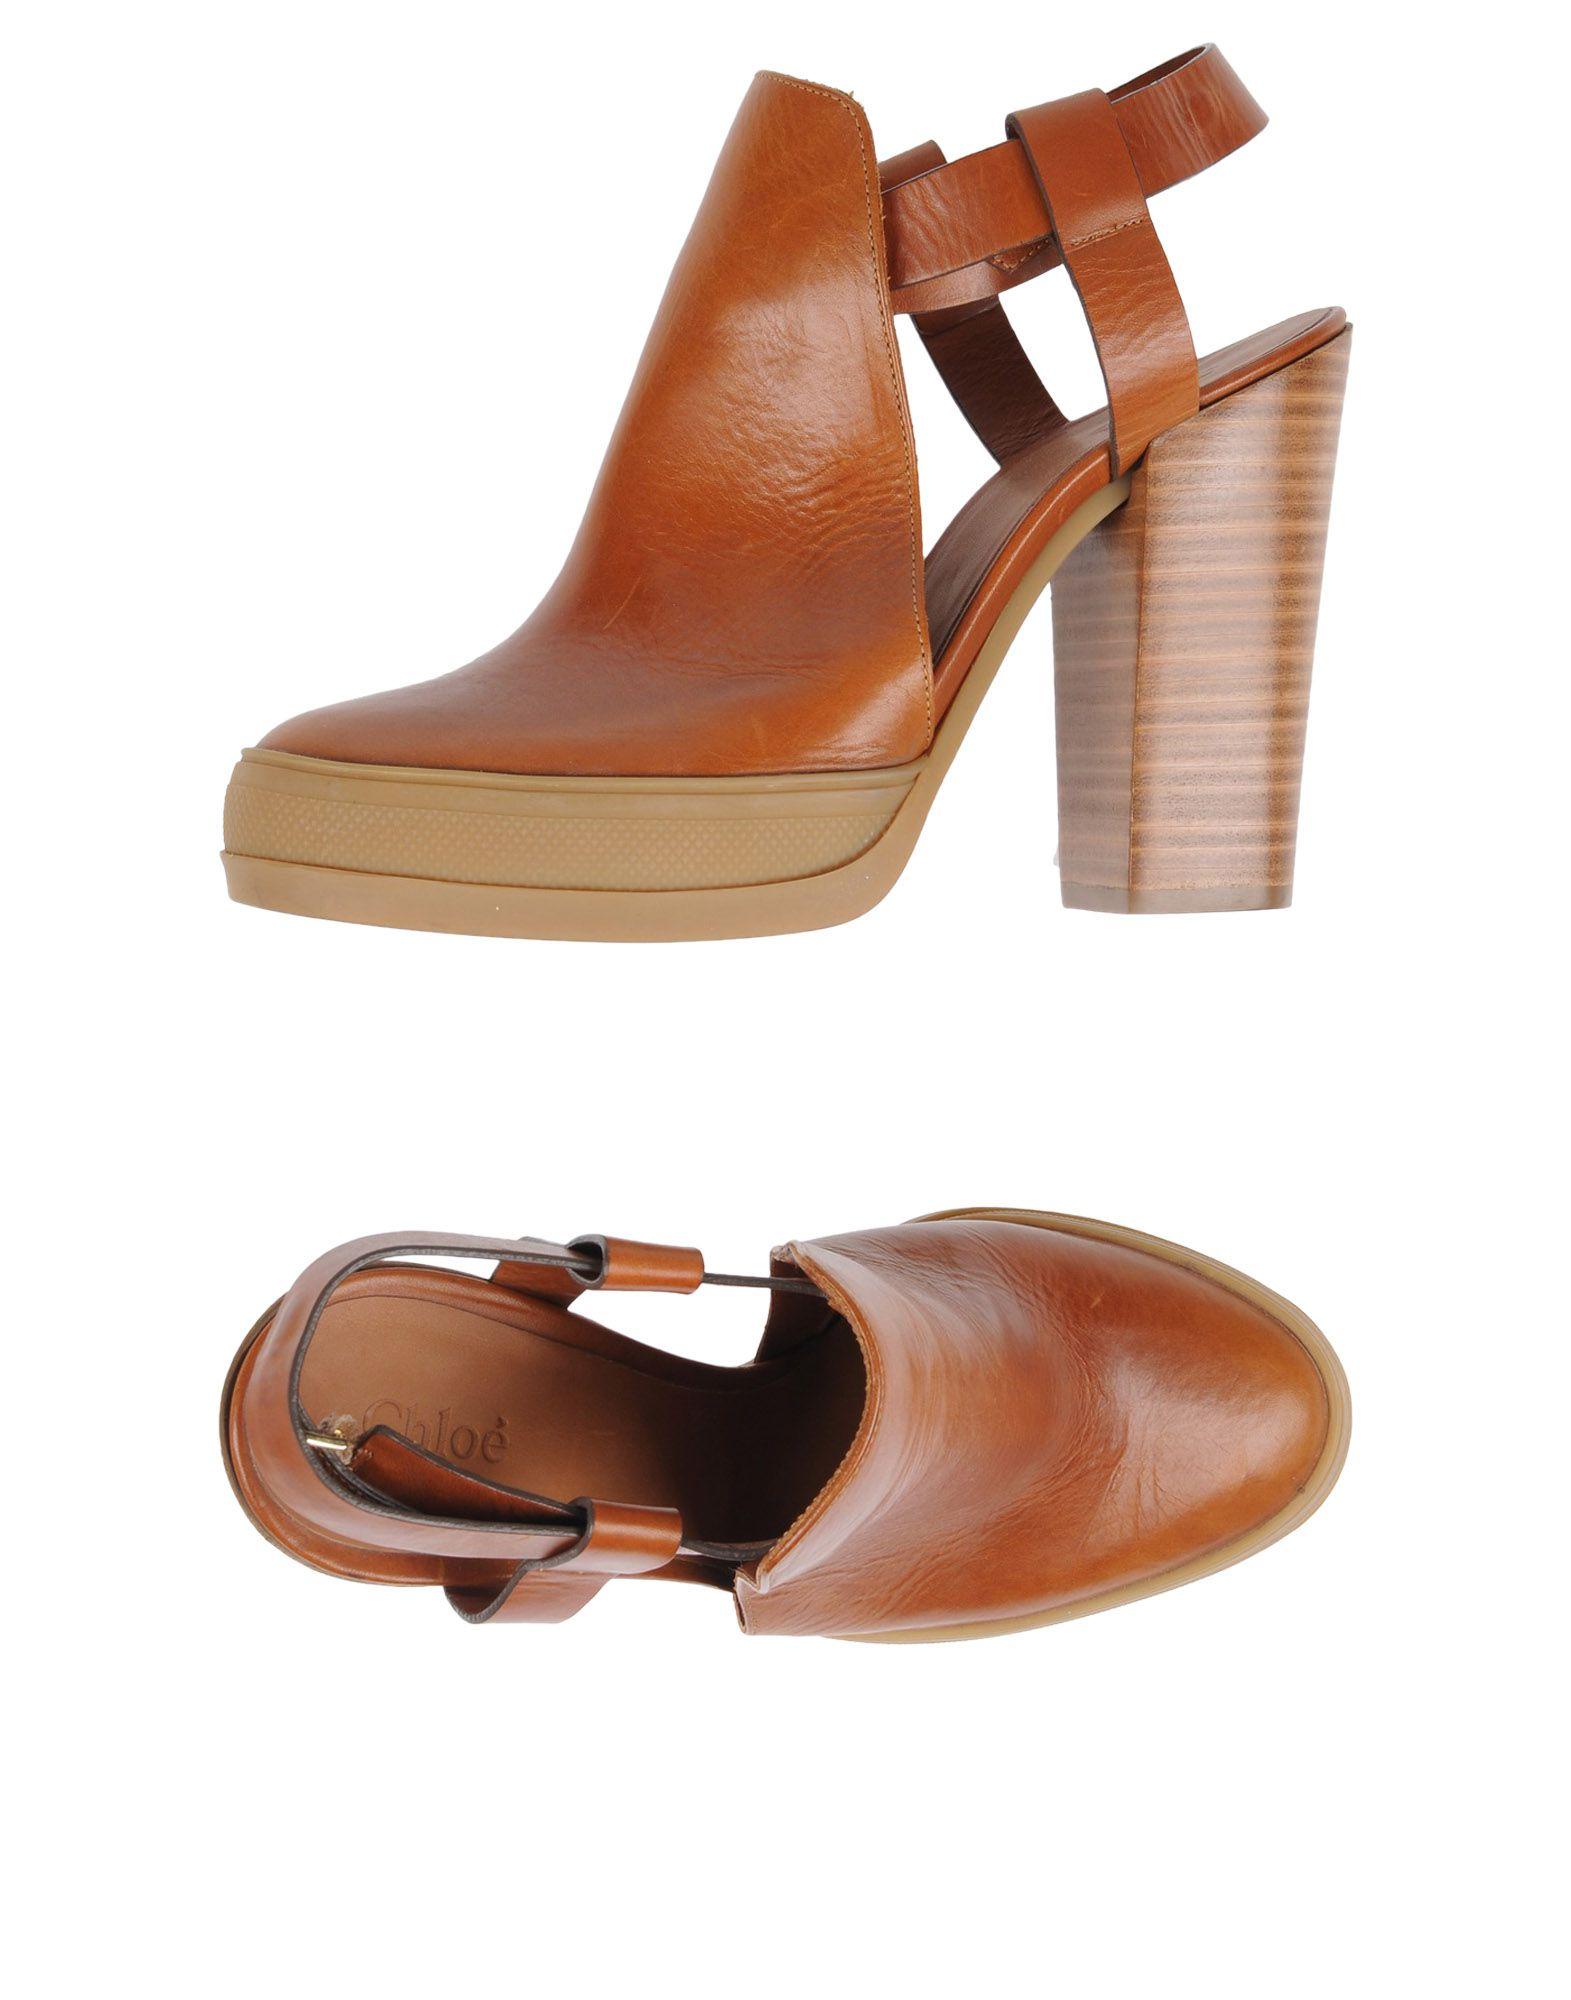 Chloé Pantoletten Damen  11462076DUGünstige gut aussehende Schuhe